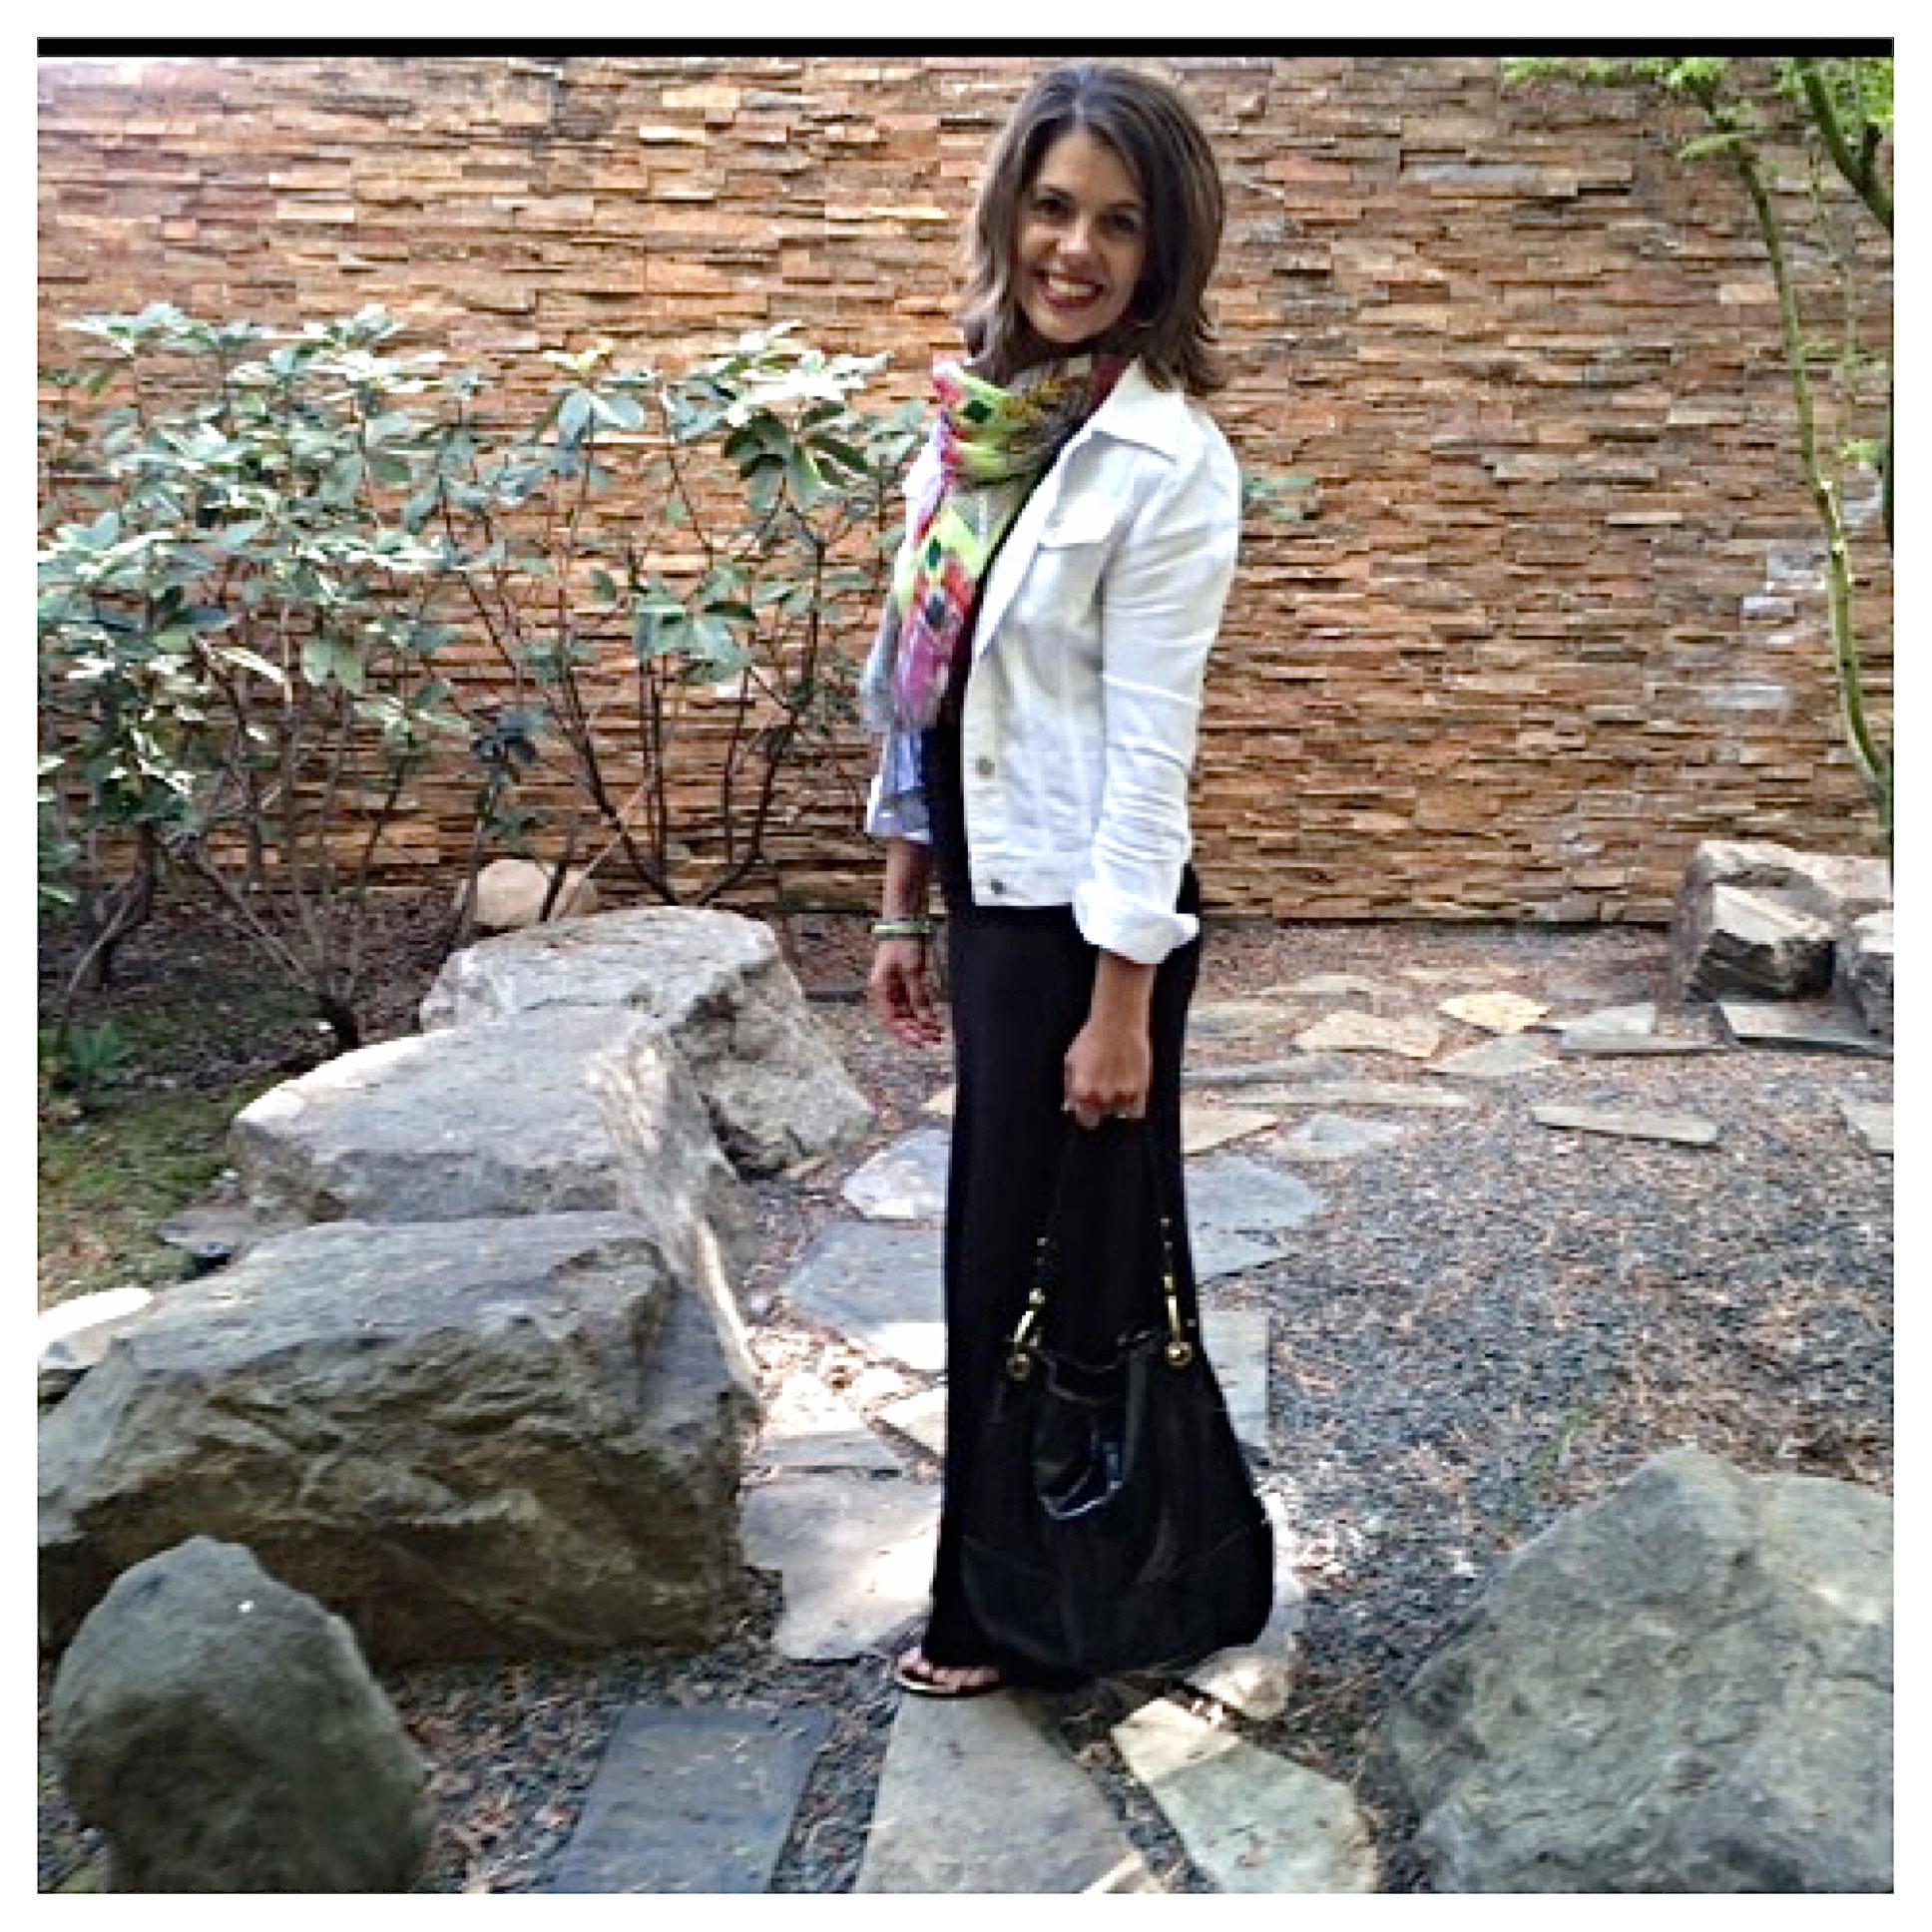 056469ceaab4 Black Maxi Dress + Denim Jacket - Cyndi Spivey